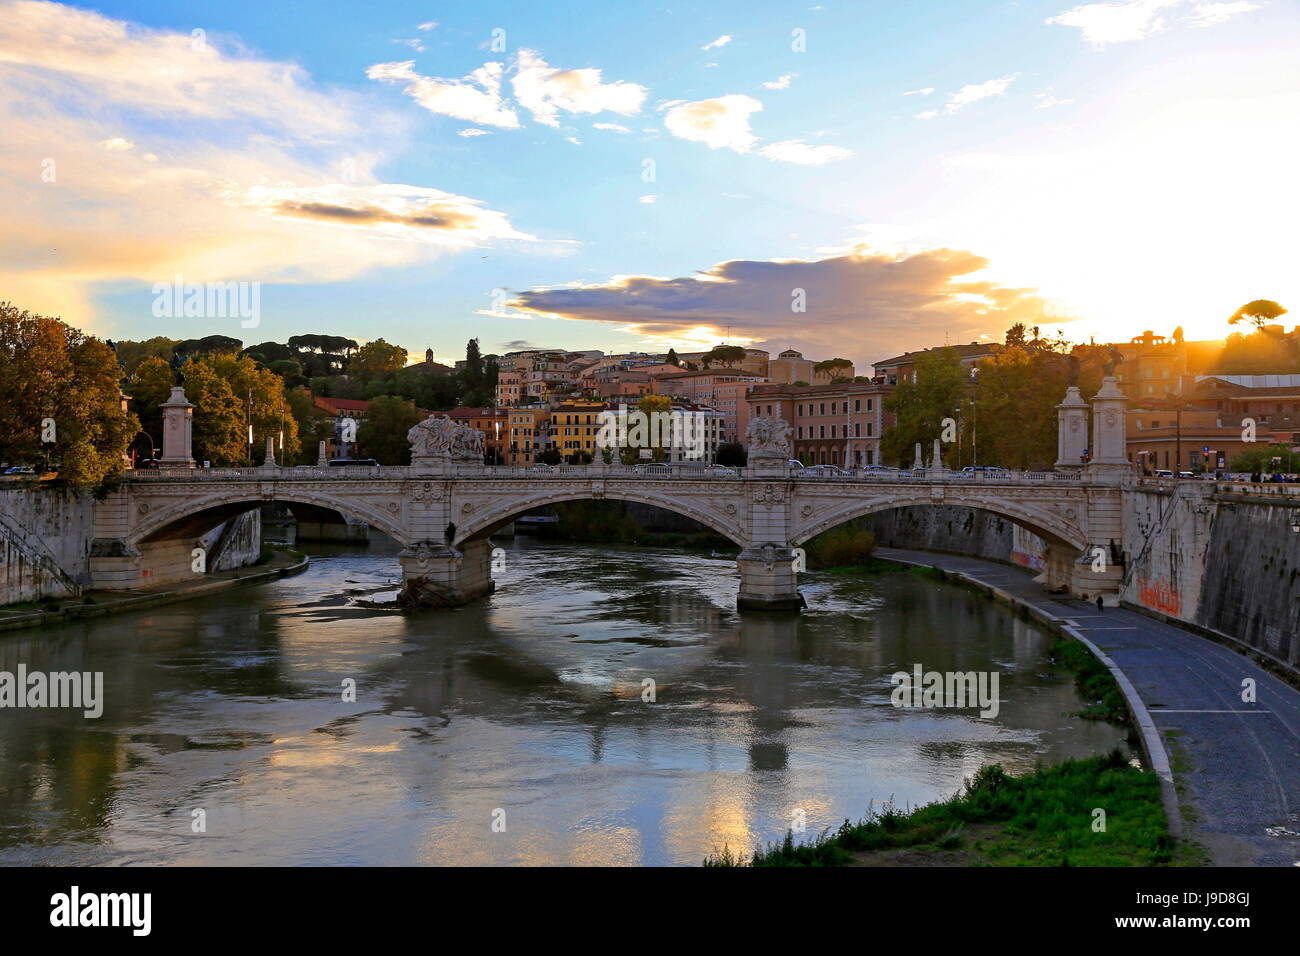 Tiber River, Rome, Lazio, Italy, Europe - Stock Image